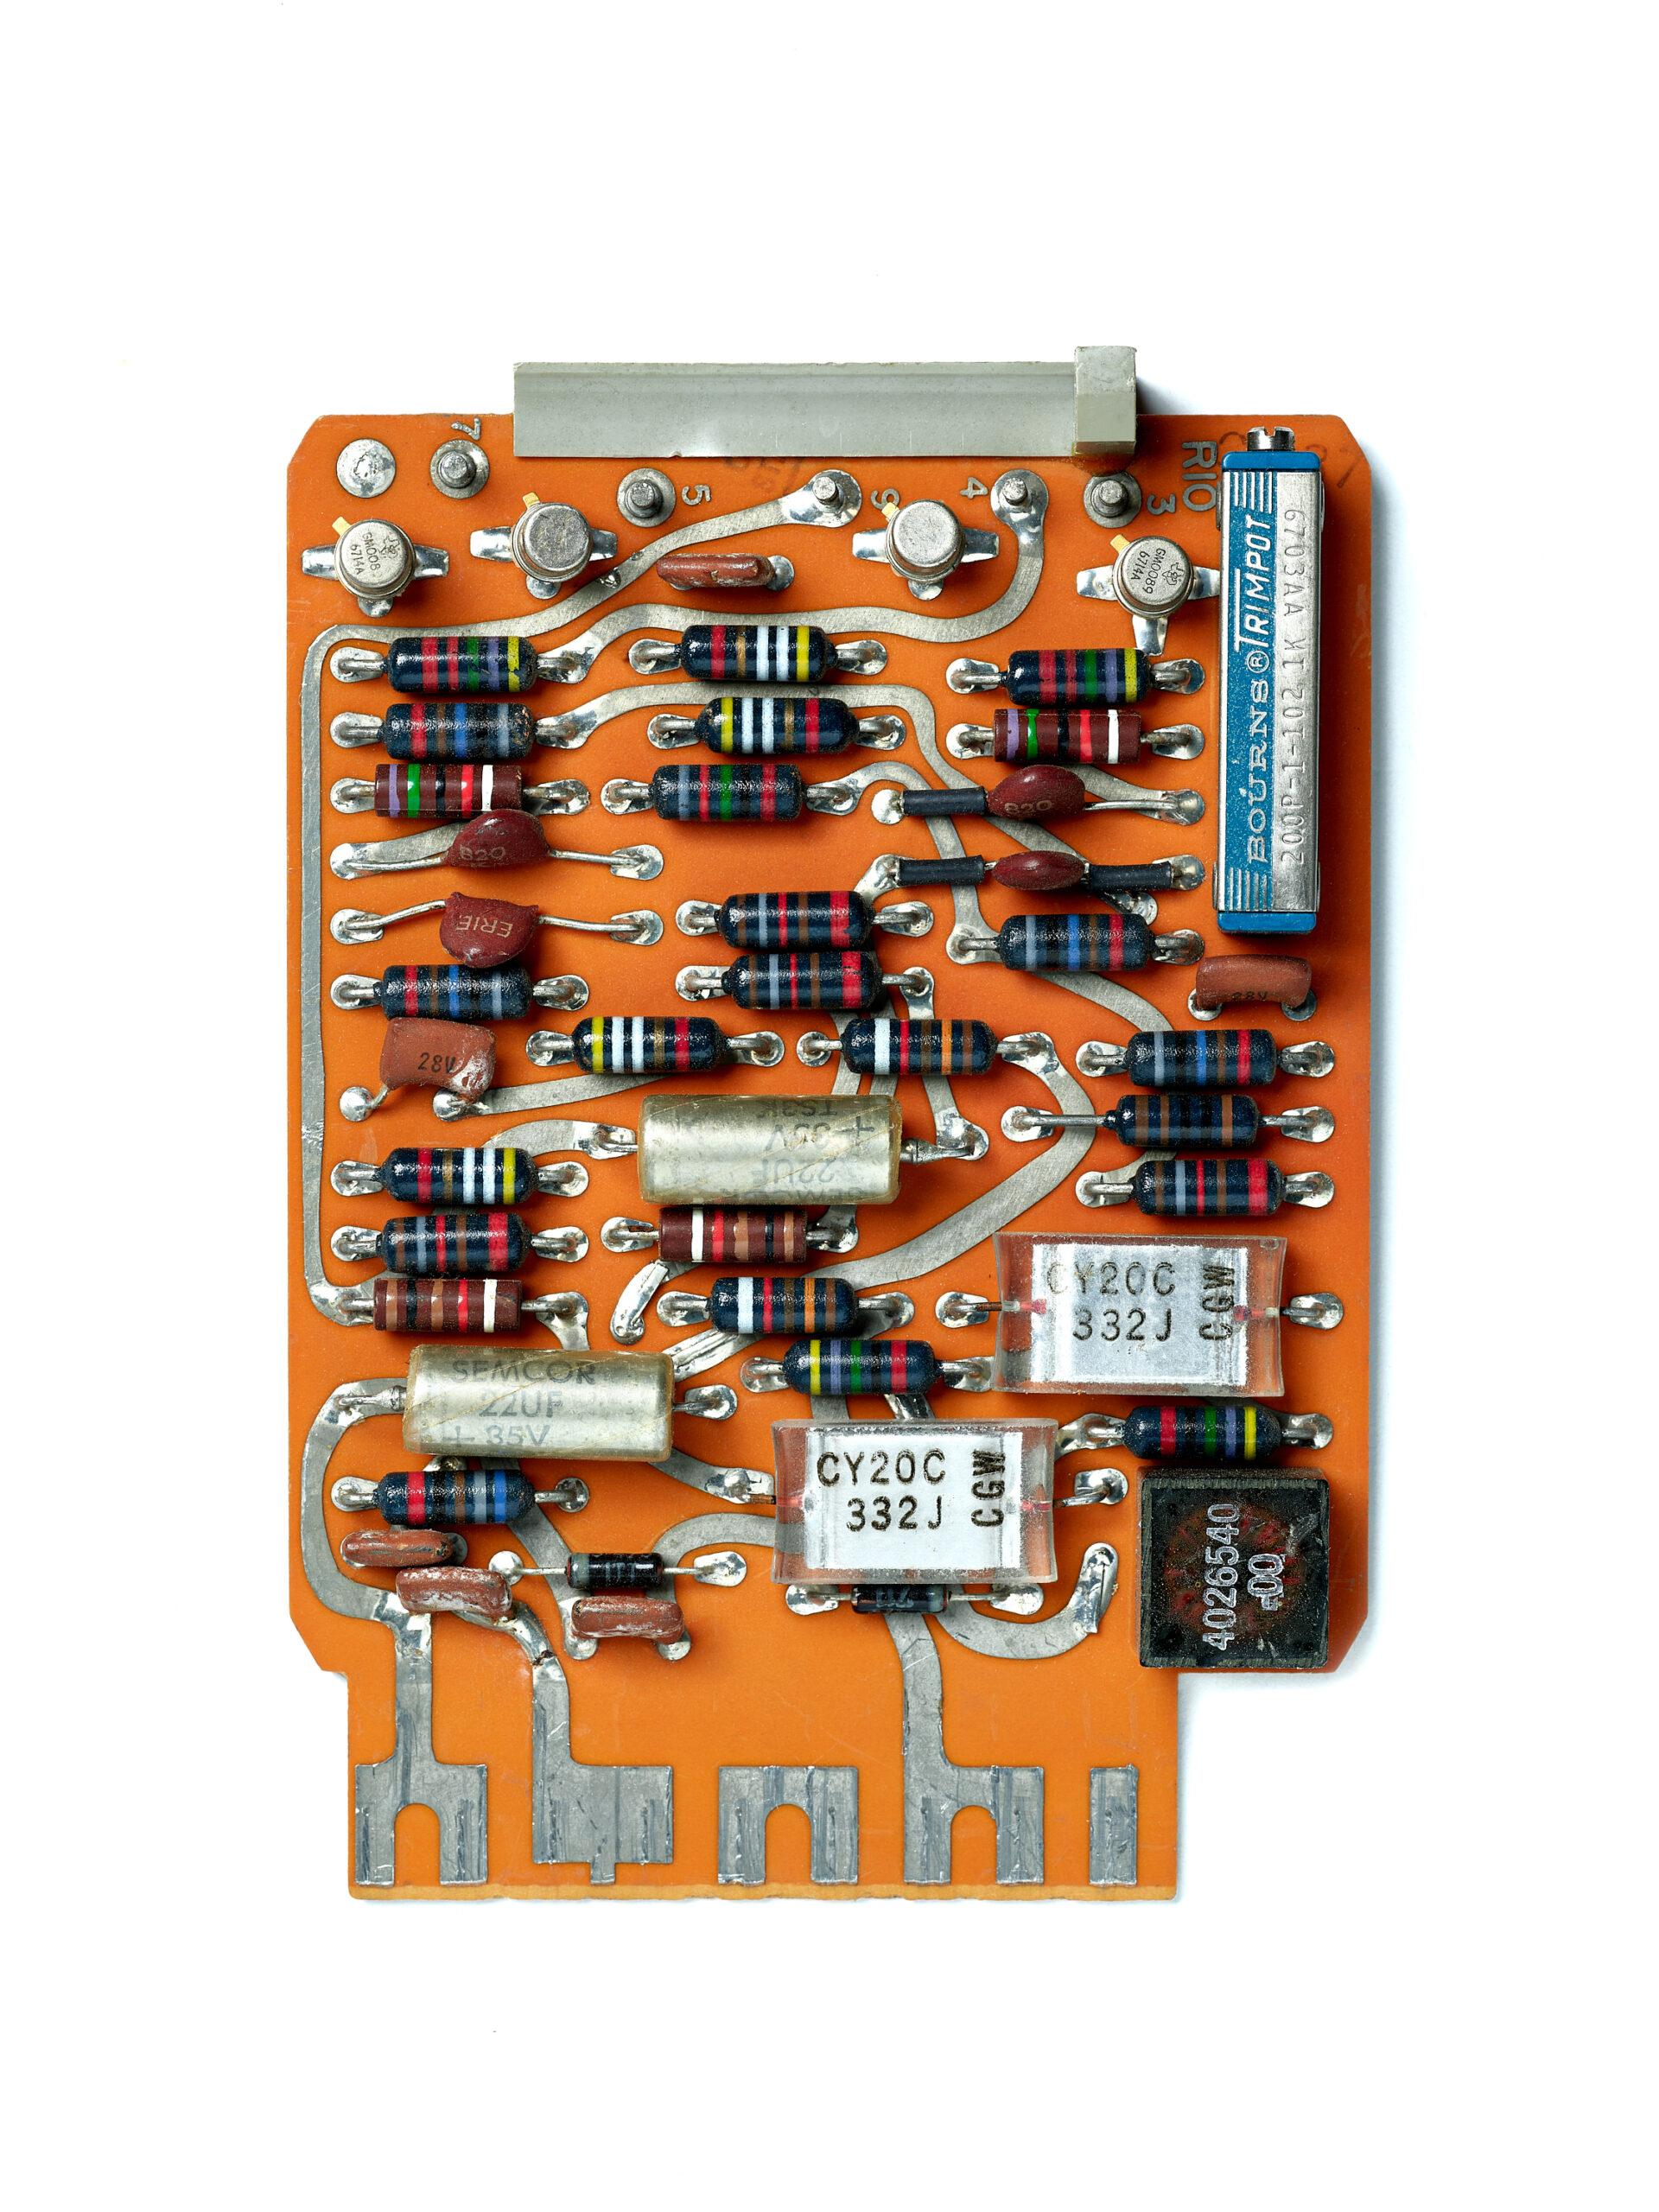 UNIVAC C-682 Card. circuit board, computer, mainframe, tech history, transistors, vintage computing.